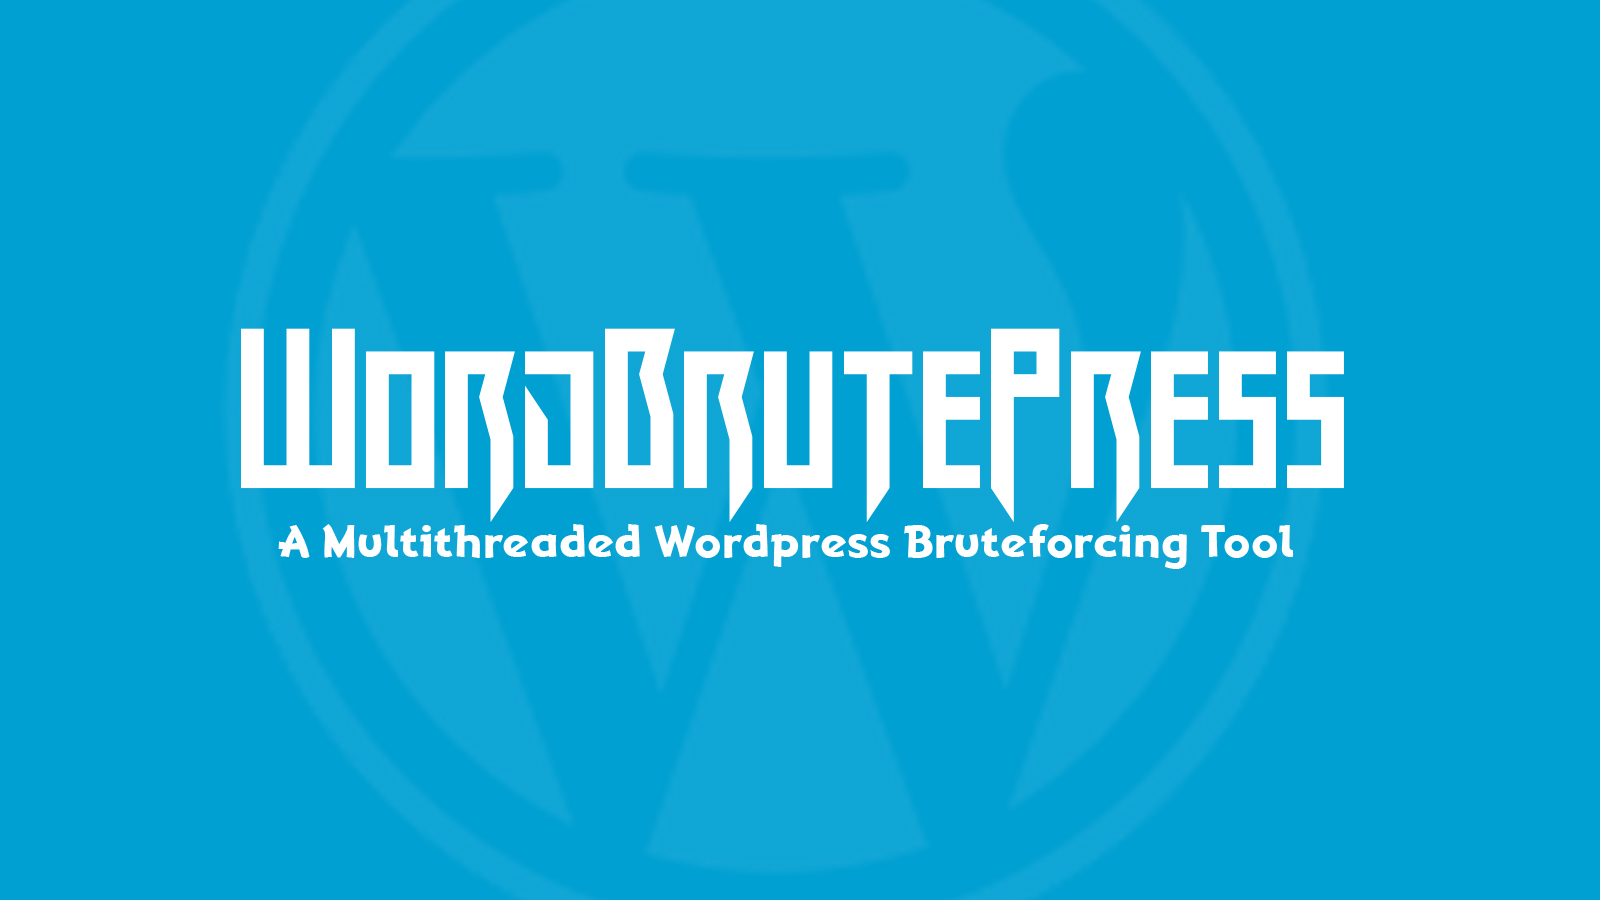 WordBrutePress - A Multithreaded Wordpress Bruteforcing Tool